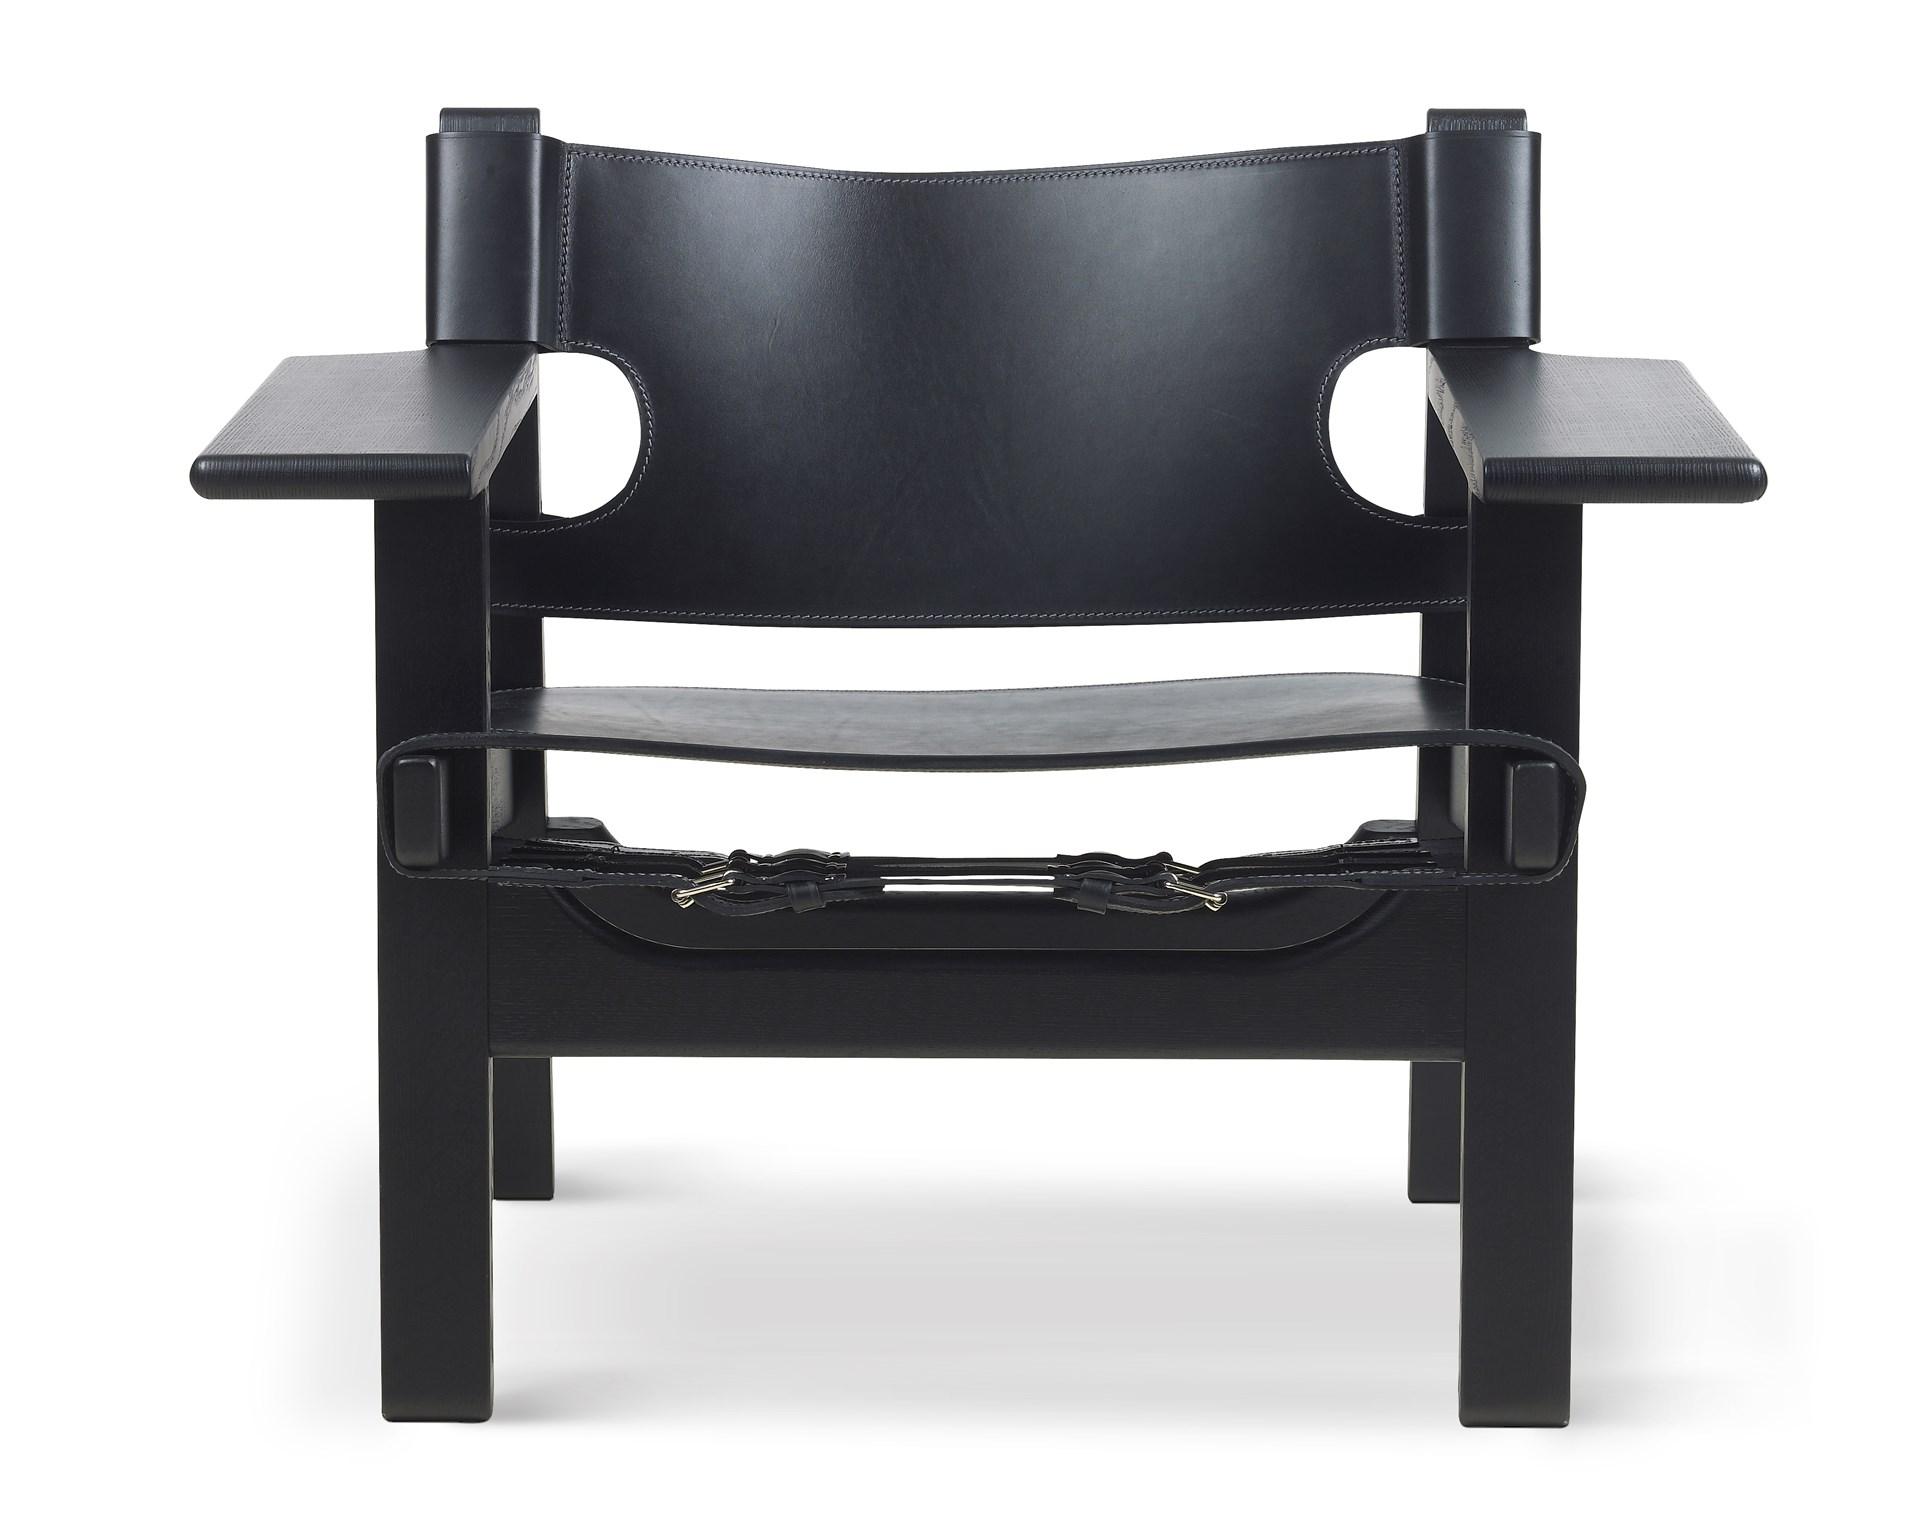 Fauteuil Leer Design.Spanish Chair Fauteuil Design Borge Mogensen Fredericia